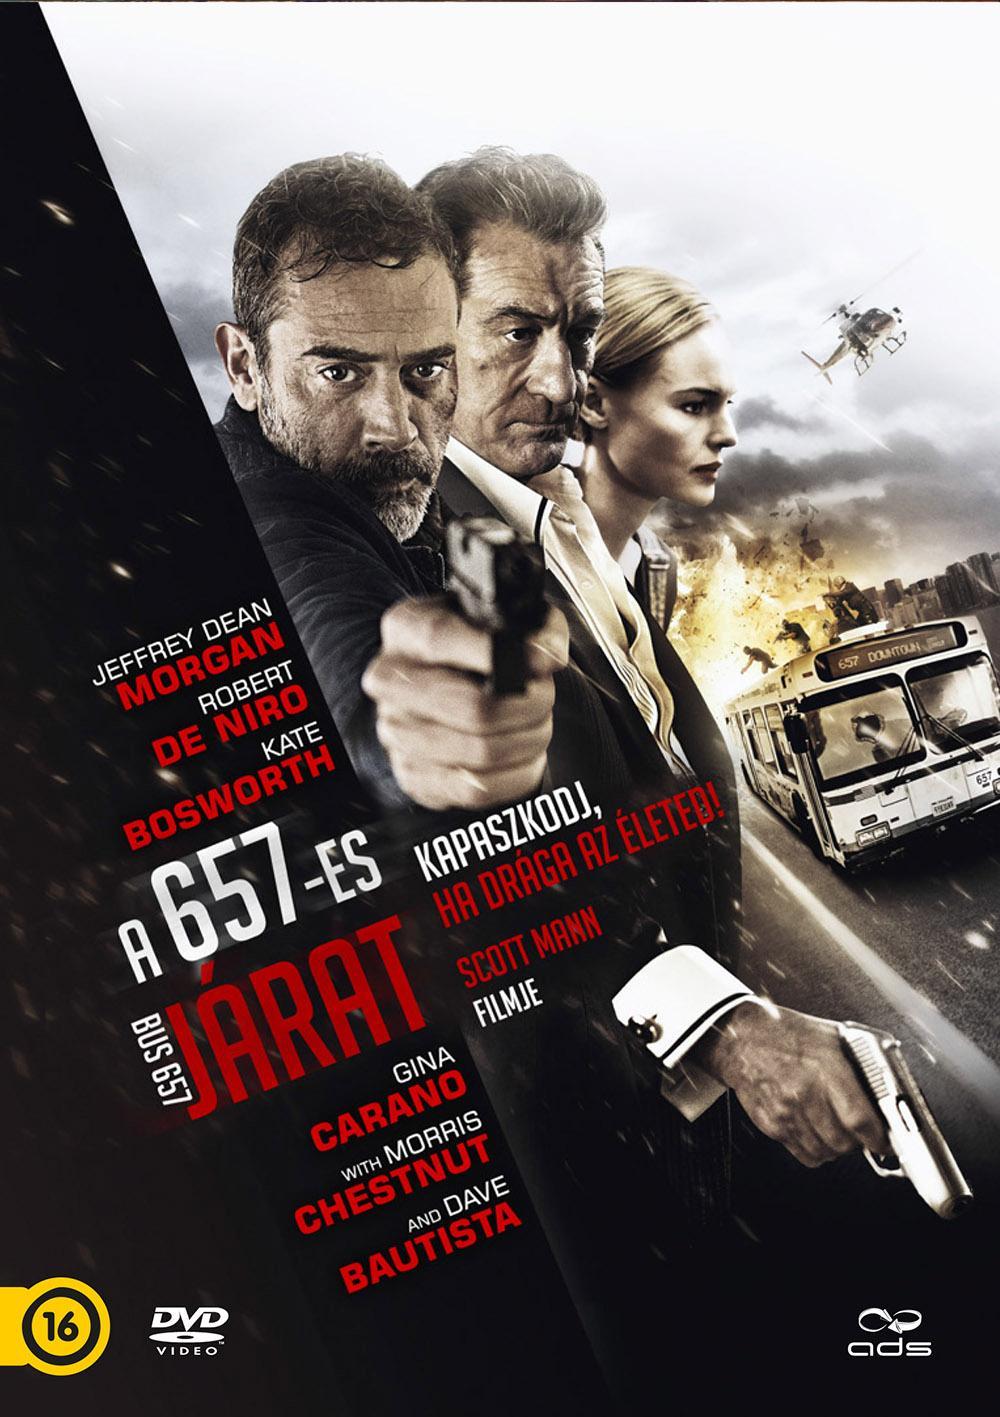 - A 657-ES JÁRAT - DVD -